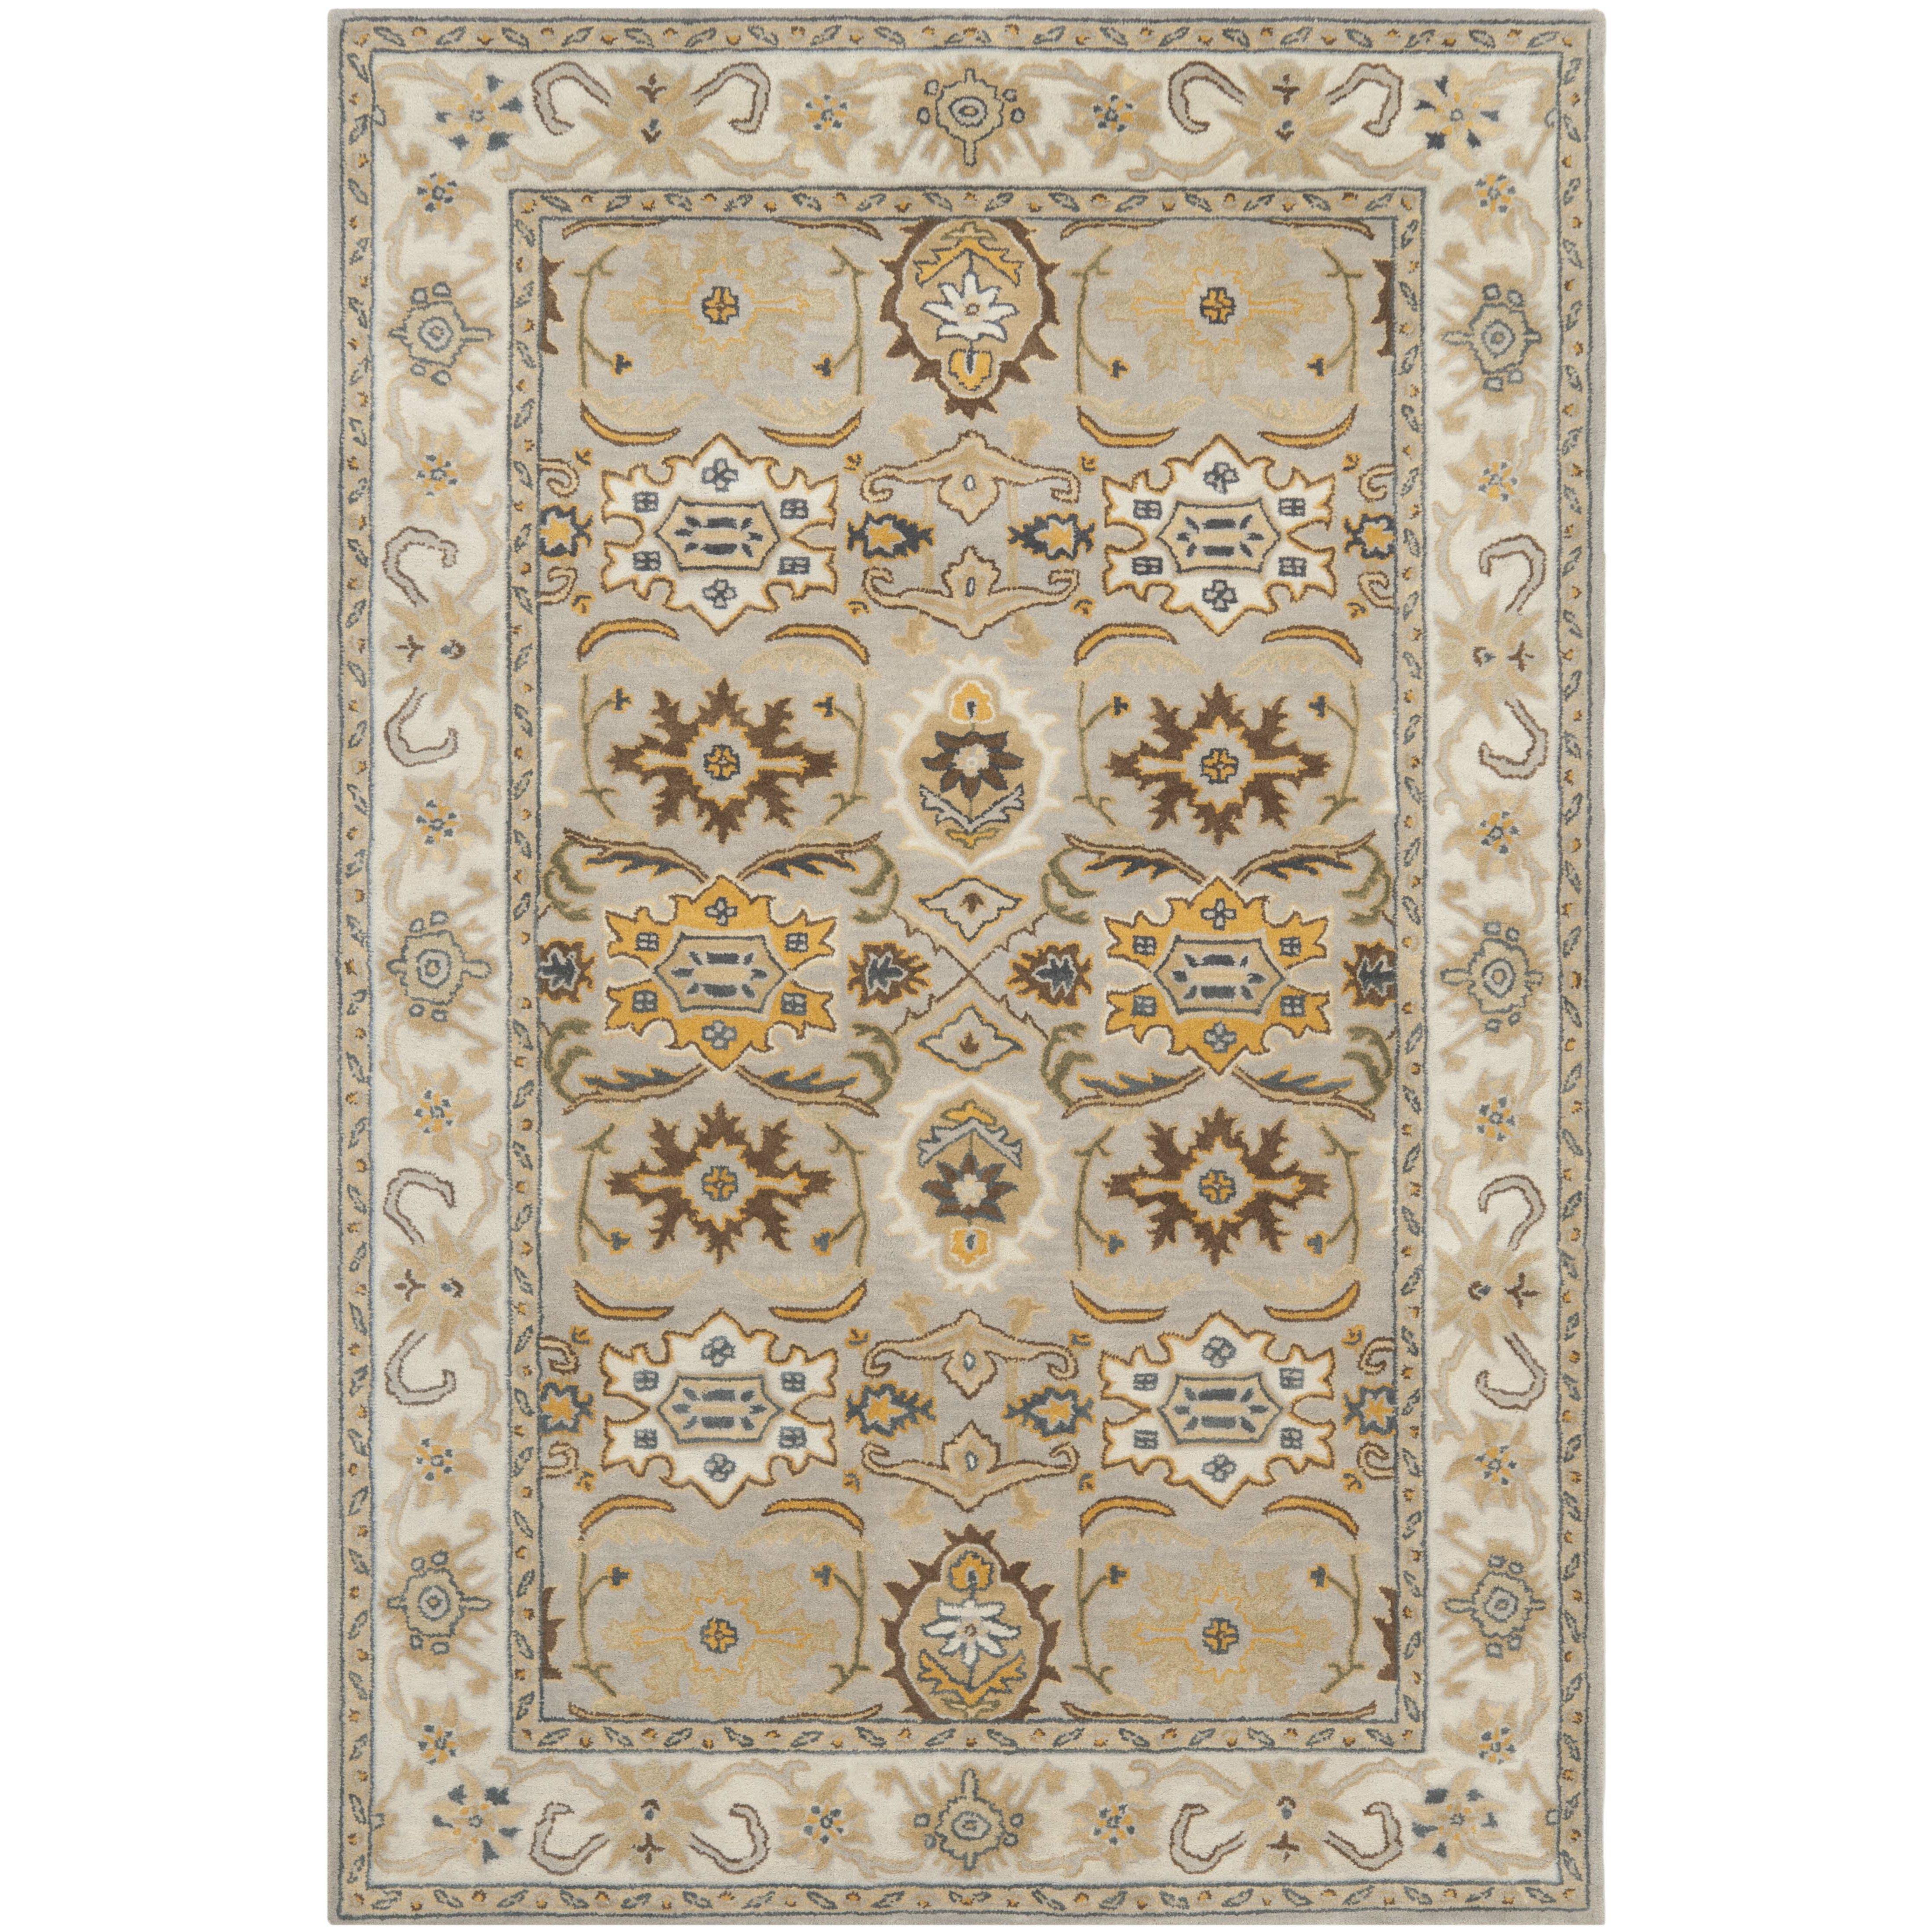 safavieh heritage light grey black area rug reviews wayfair. Black Bedroom Furniture Sets. Home Design Ideas